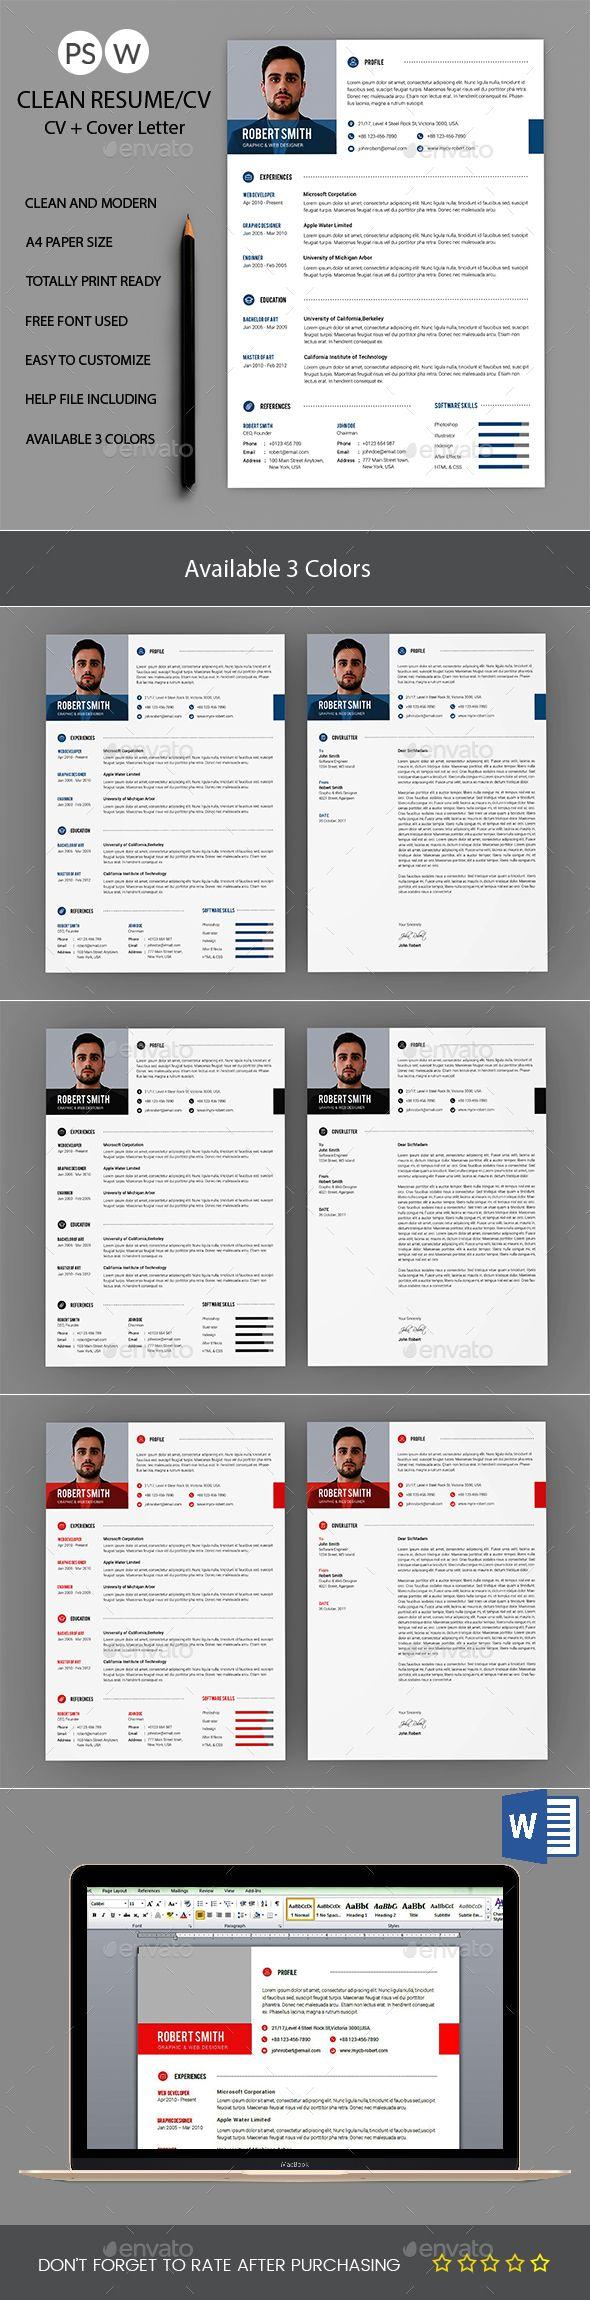 46 best cv 2 elegant images on Pinterest | Resume templates, Cv ...